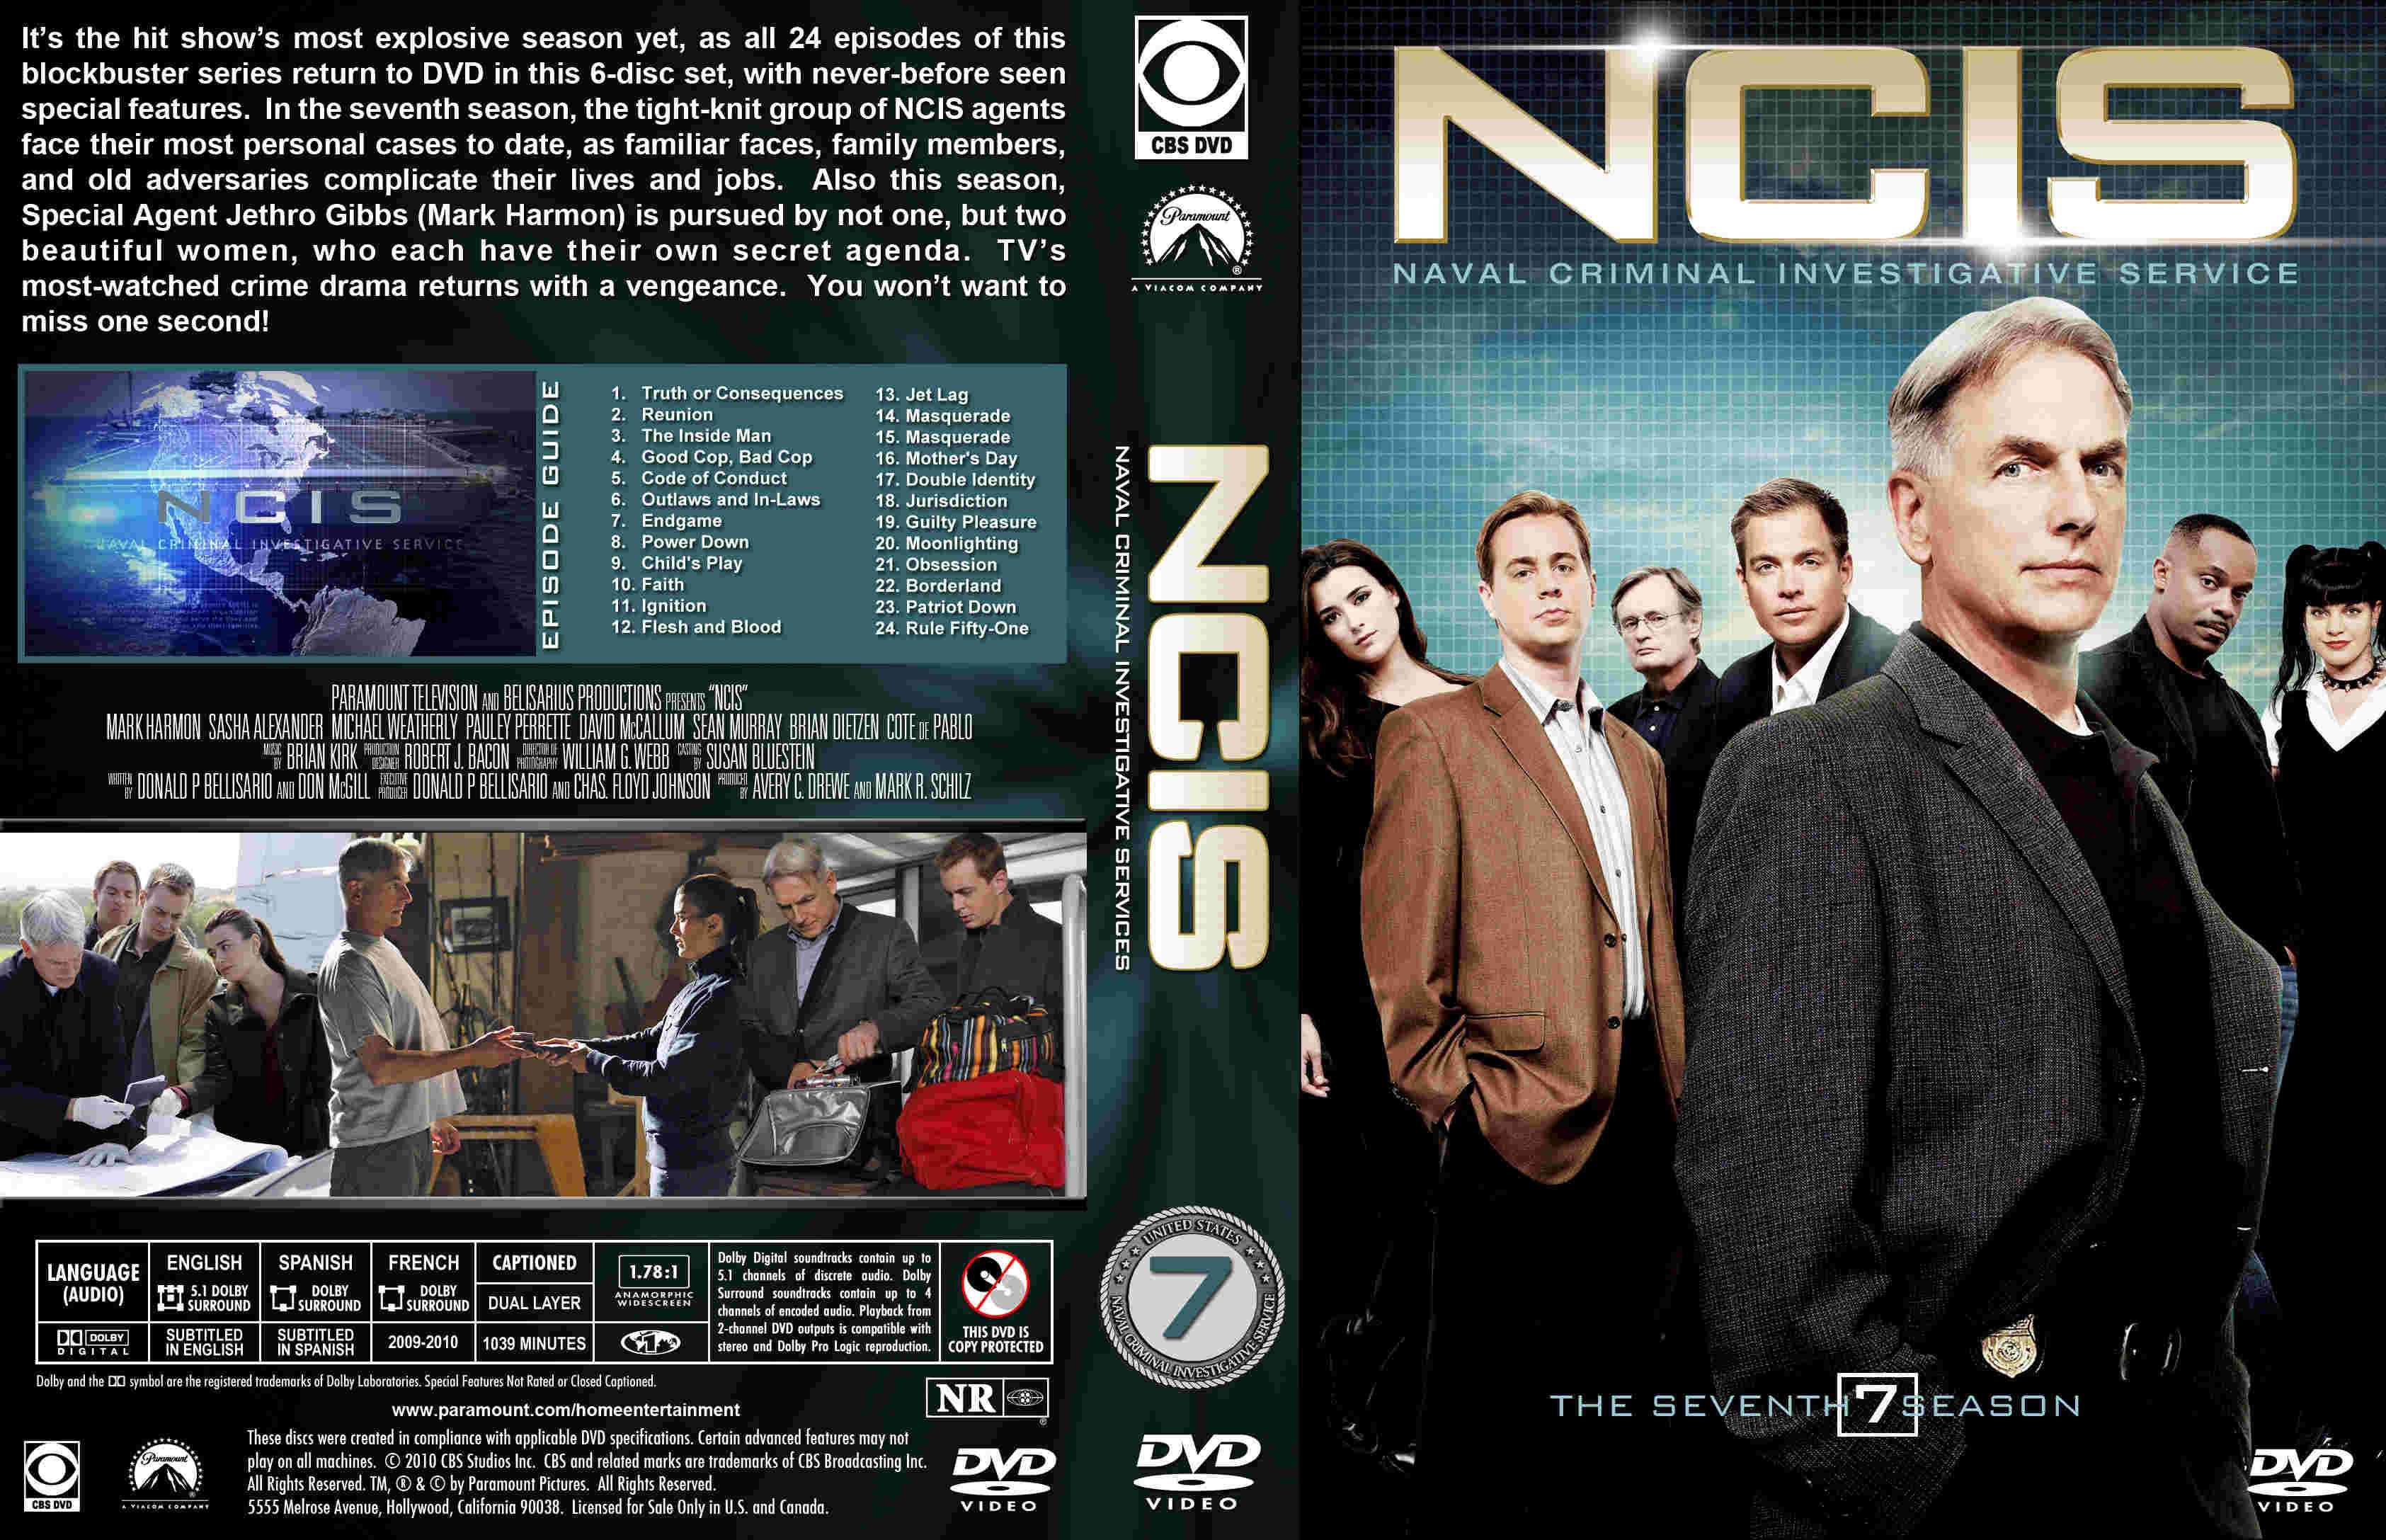 Covers Box Sk Ncis Season 7 High Quality Dvd Blueray Movie